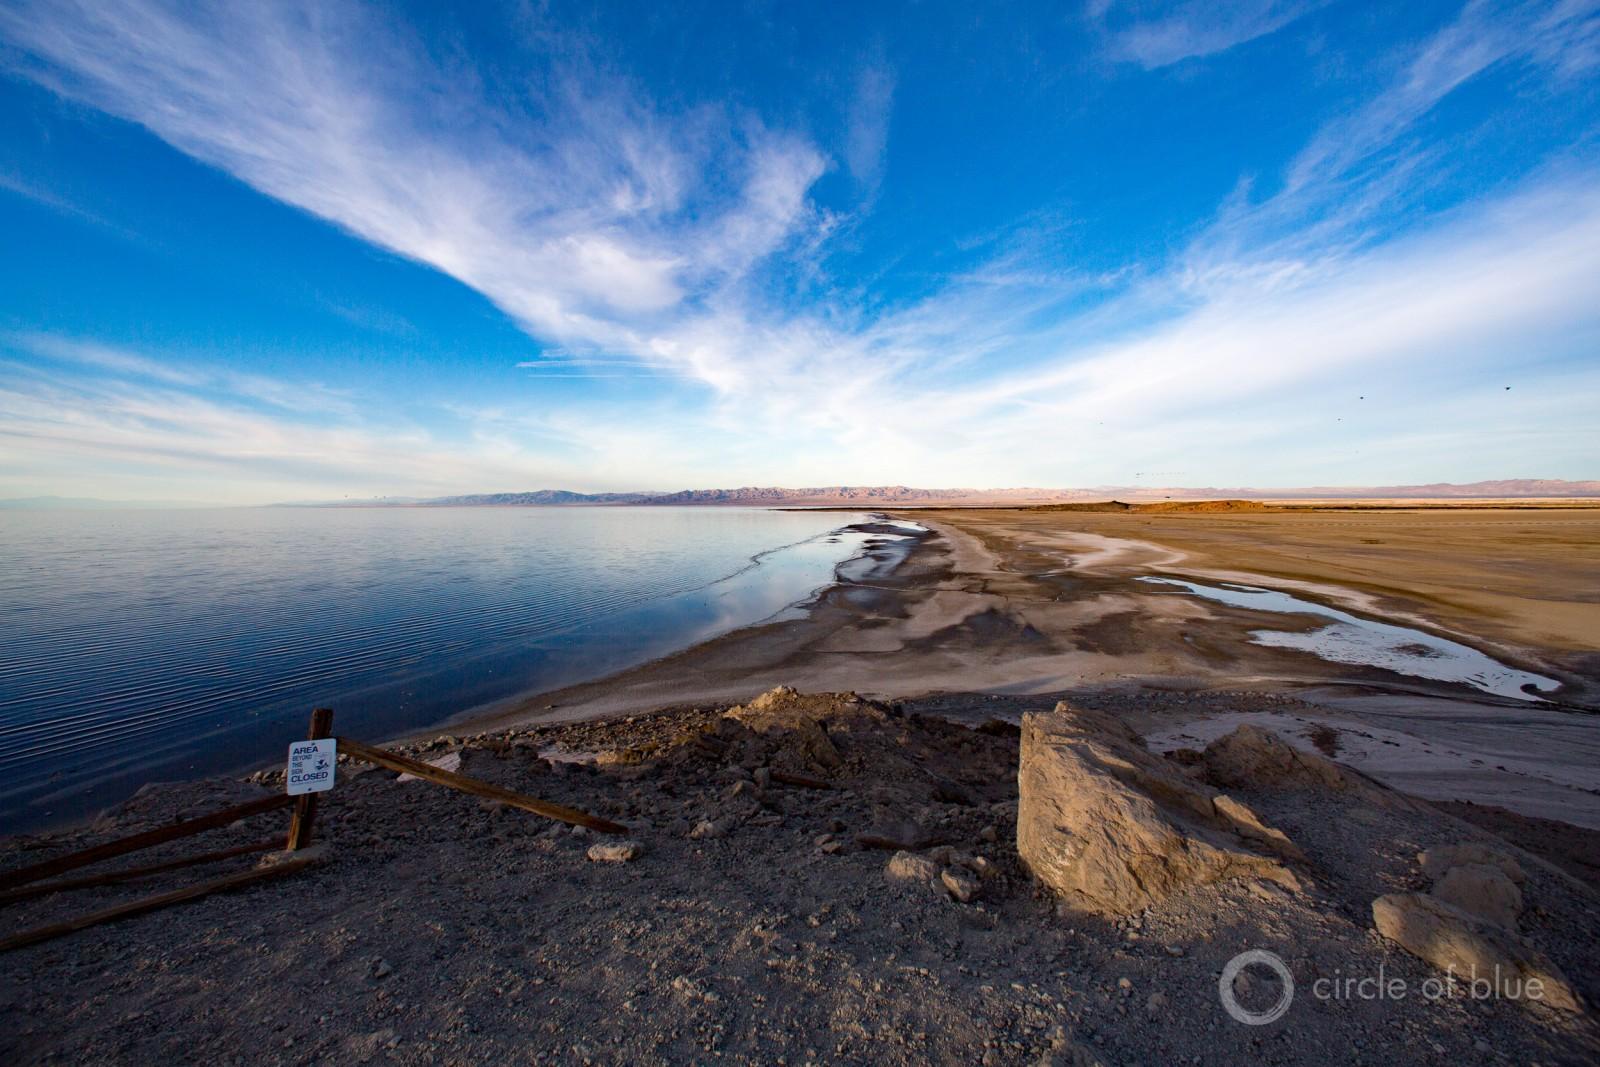 Speaking of Water: Michael Cohen on the Salton Sea